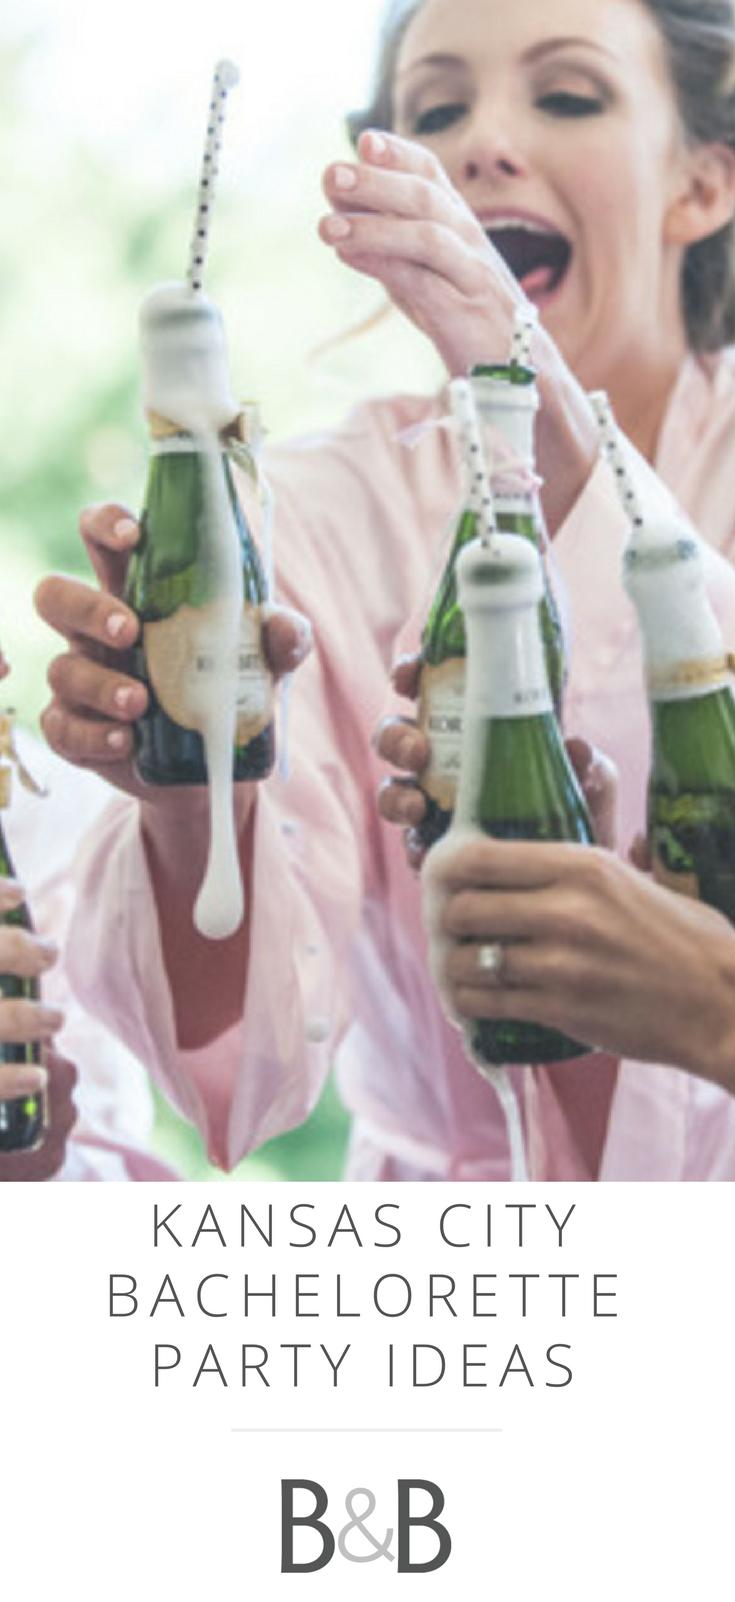 kansas city bachelorette party ideas | mini champagne bottles, mini